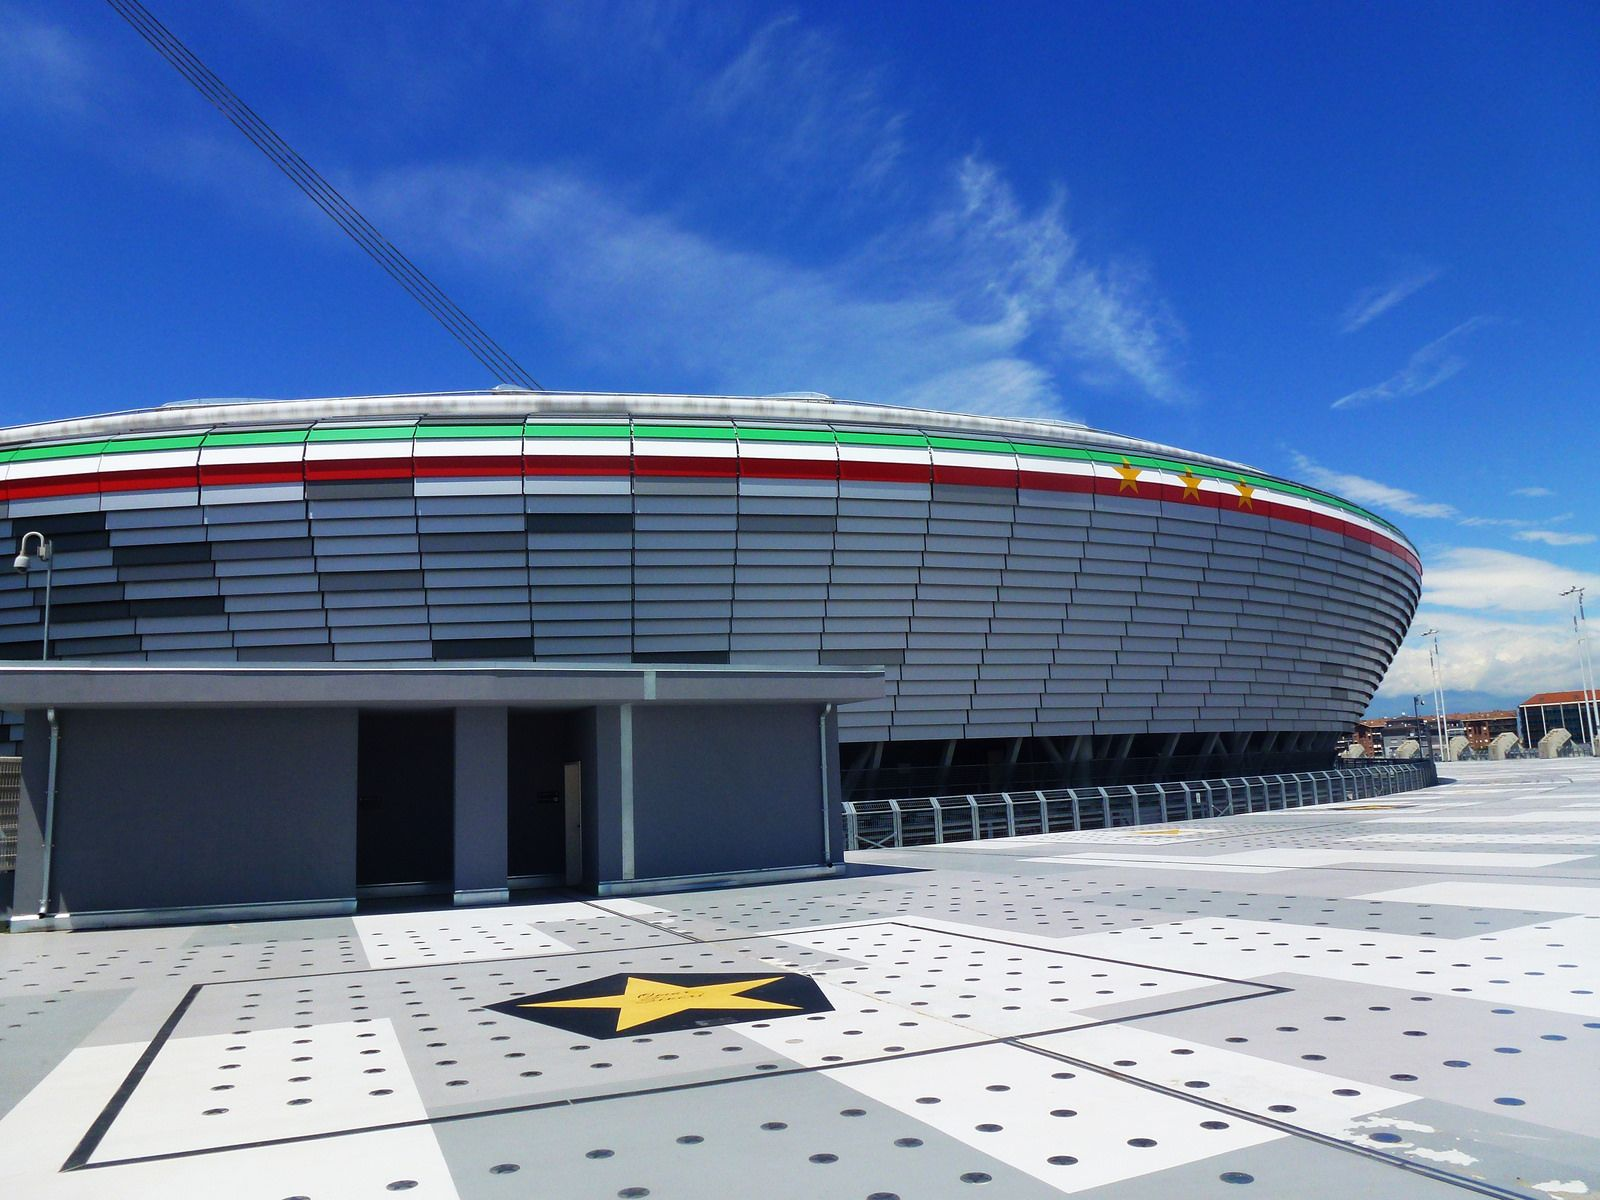 Allianz Stadium of Turin (Juventus Stadium) - StadiumDB.com